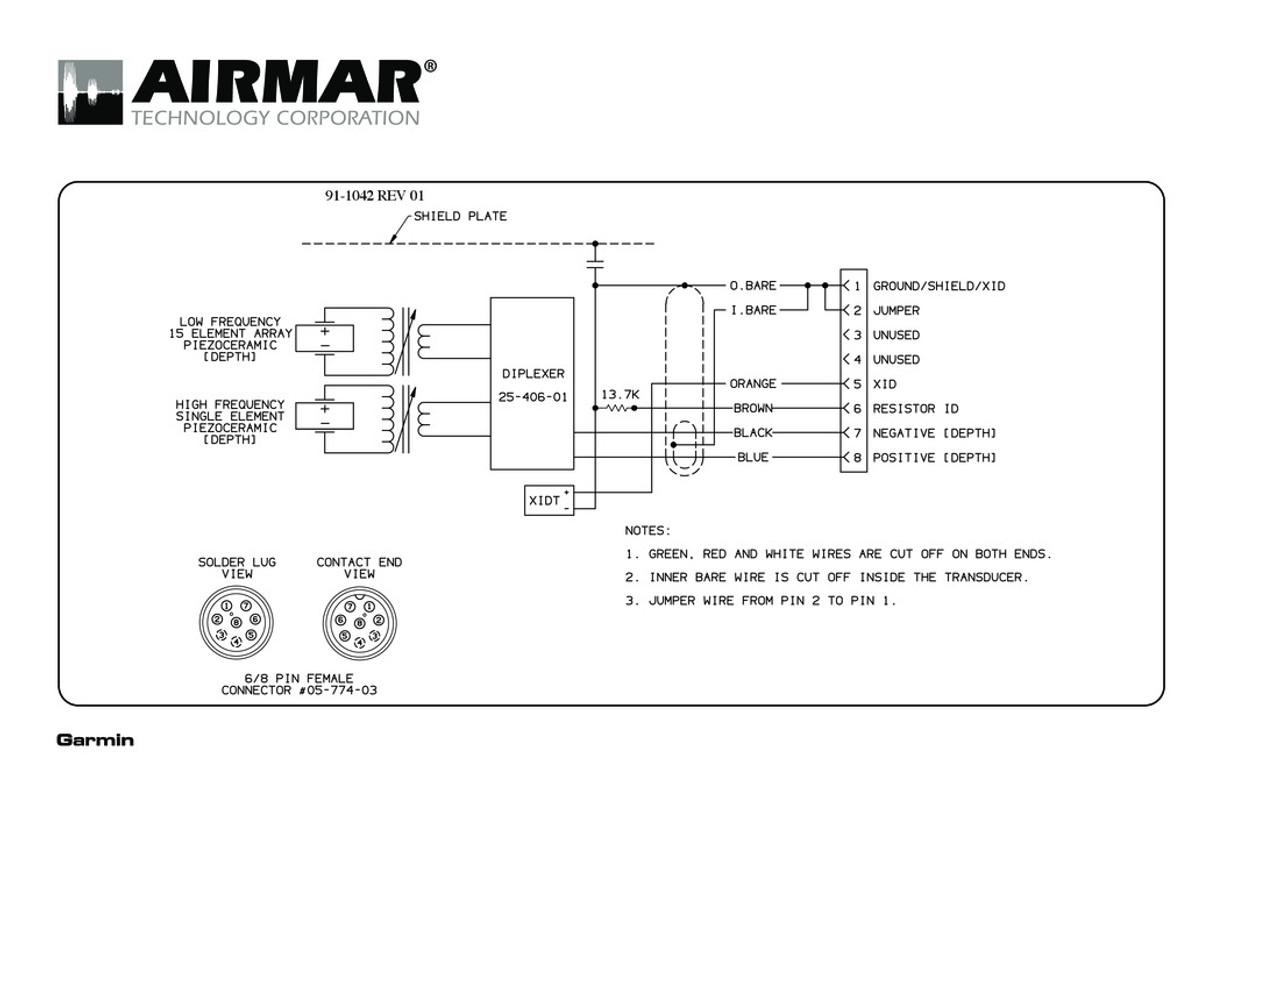 Garmin 2010c Wiring Diagram   Better Wiring Diagram Online on ethernet wiring diagram, bluetooth wiring diagram, microphone wiring diagram, rs232 wiring diagram, usb wiring diagram, autopilot wiring diagram, genlock wiring diagram, seatalk wiring diagram, wifi wiring diagram, 100base-t wiring diagram, j1939 wiring diagram, power supply wiring diagram, modbus wiring diagram, gps wiring diagram, garmin 5212 chartplotter marine wiring diagram, nema 2000 wiring diagram, automotive navigation system wiring diagram, fishfinder wiring diagram,